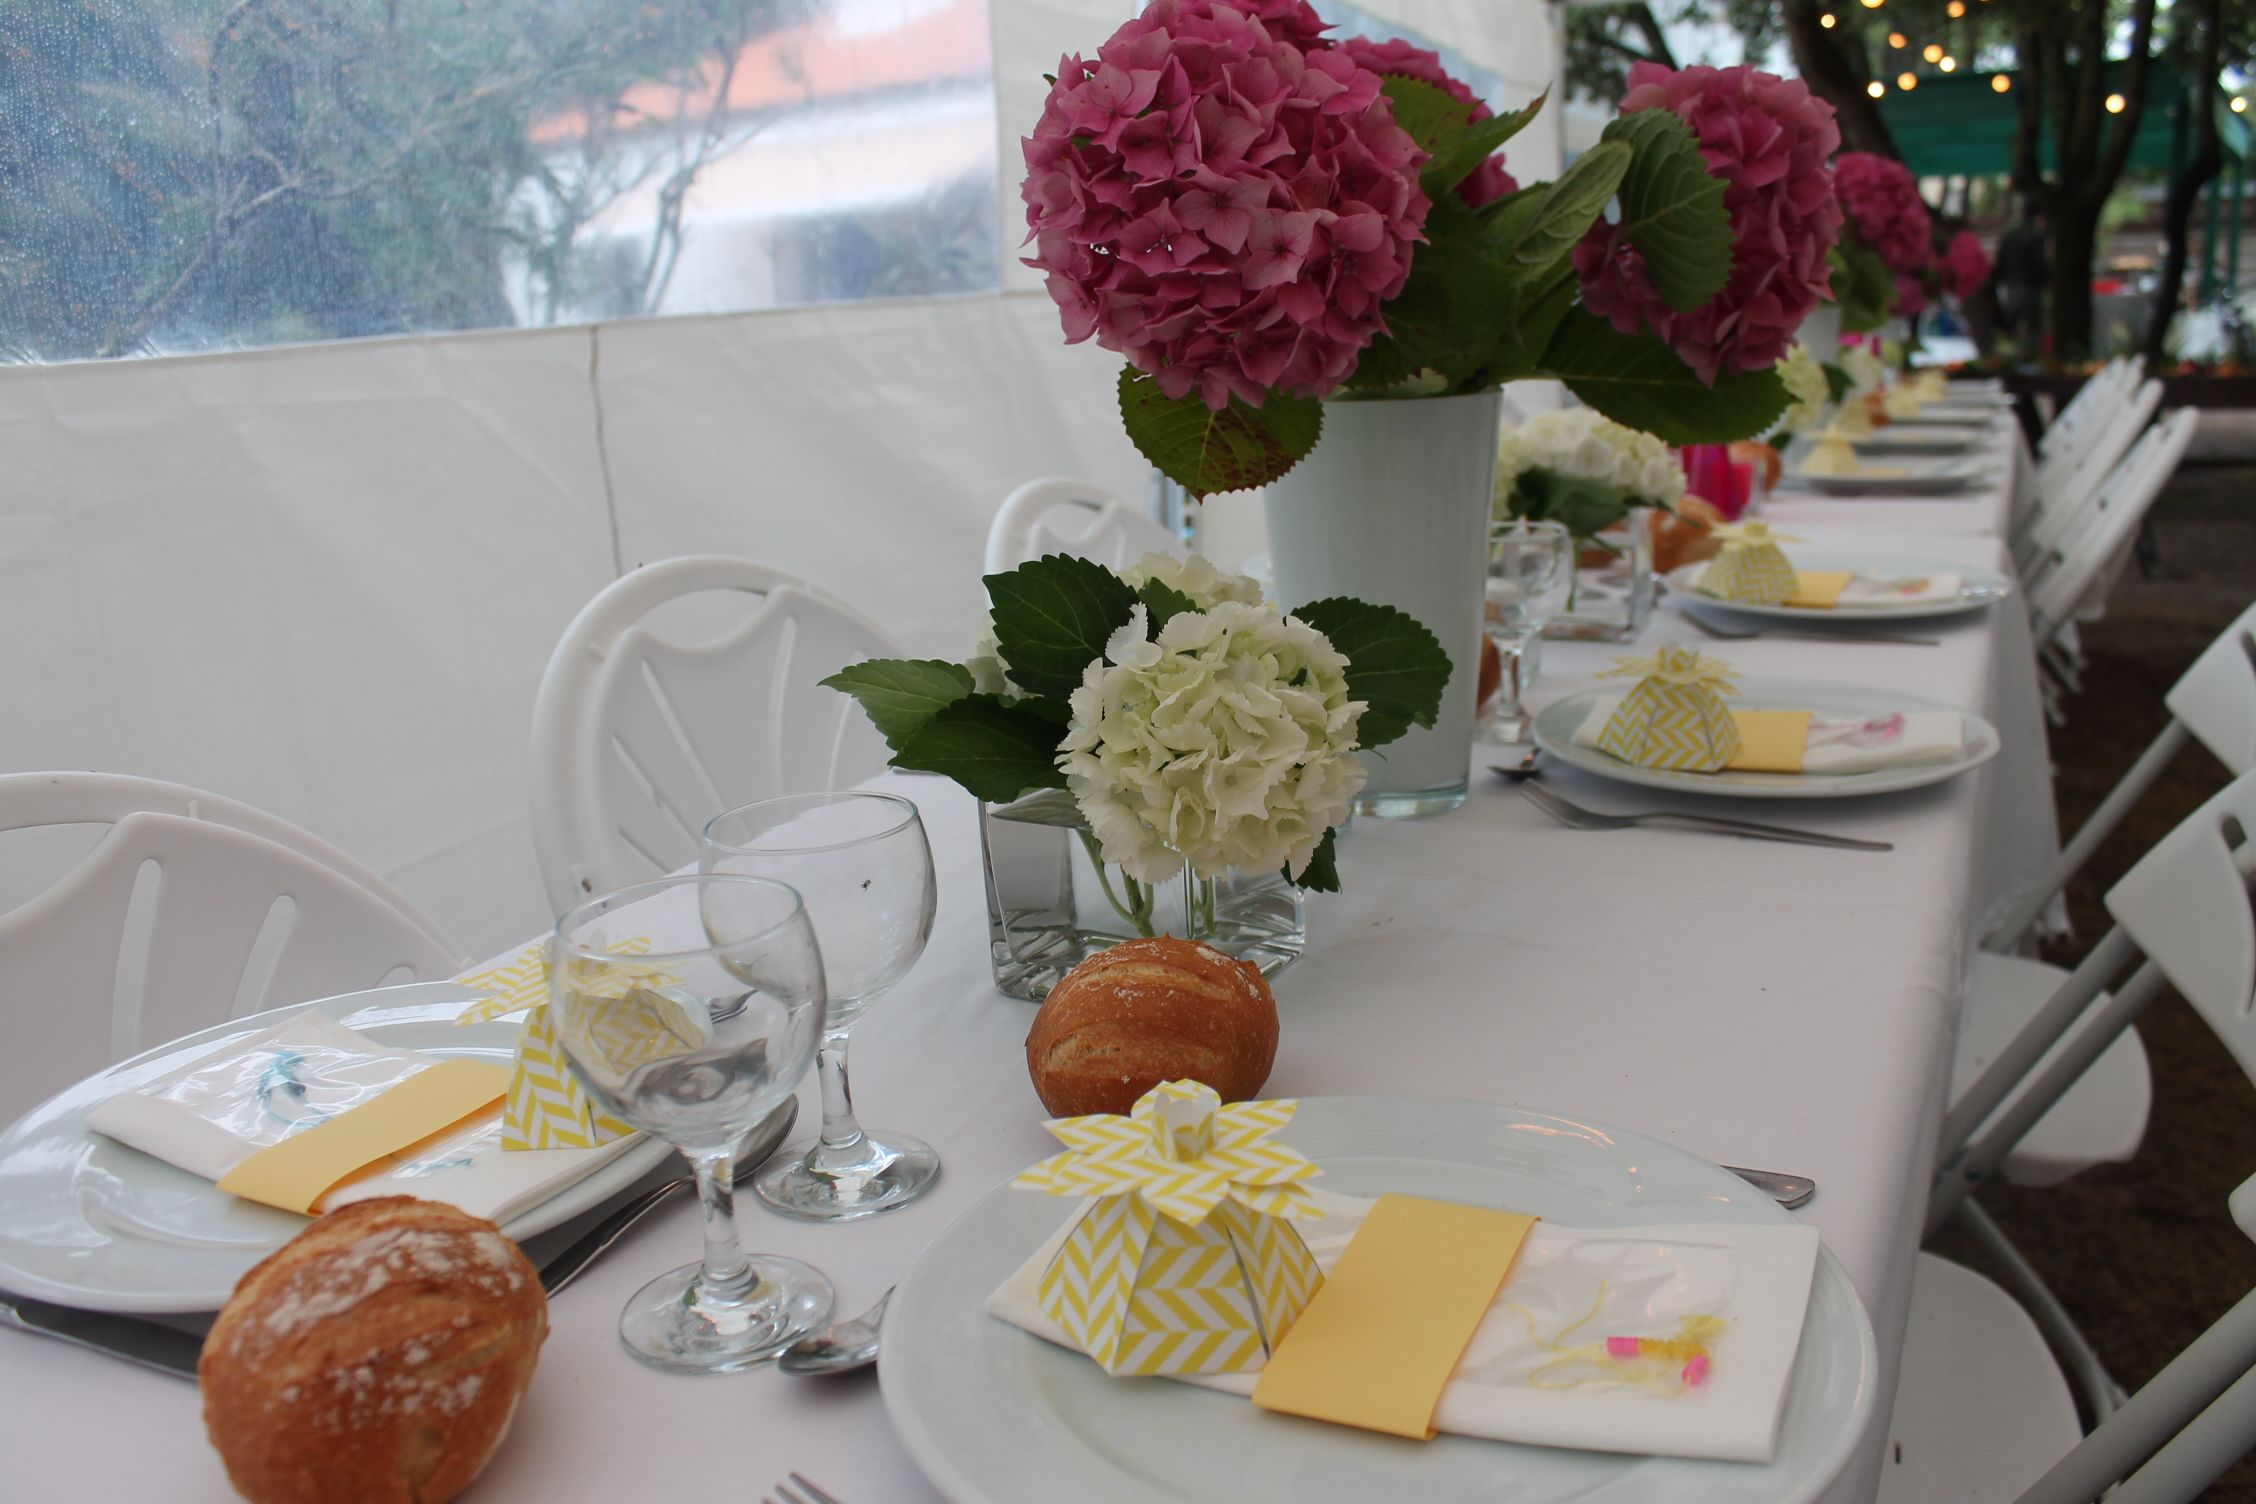 Ortensia, Fuschia, yellow flavor box from paperpresentation.com, Baptism, wedding